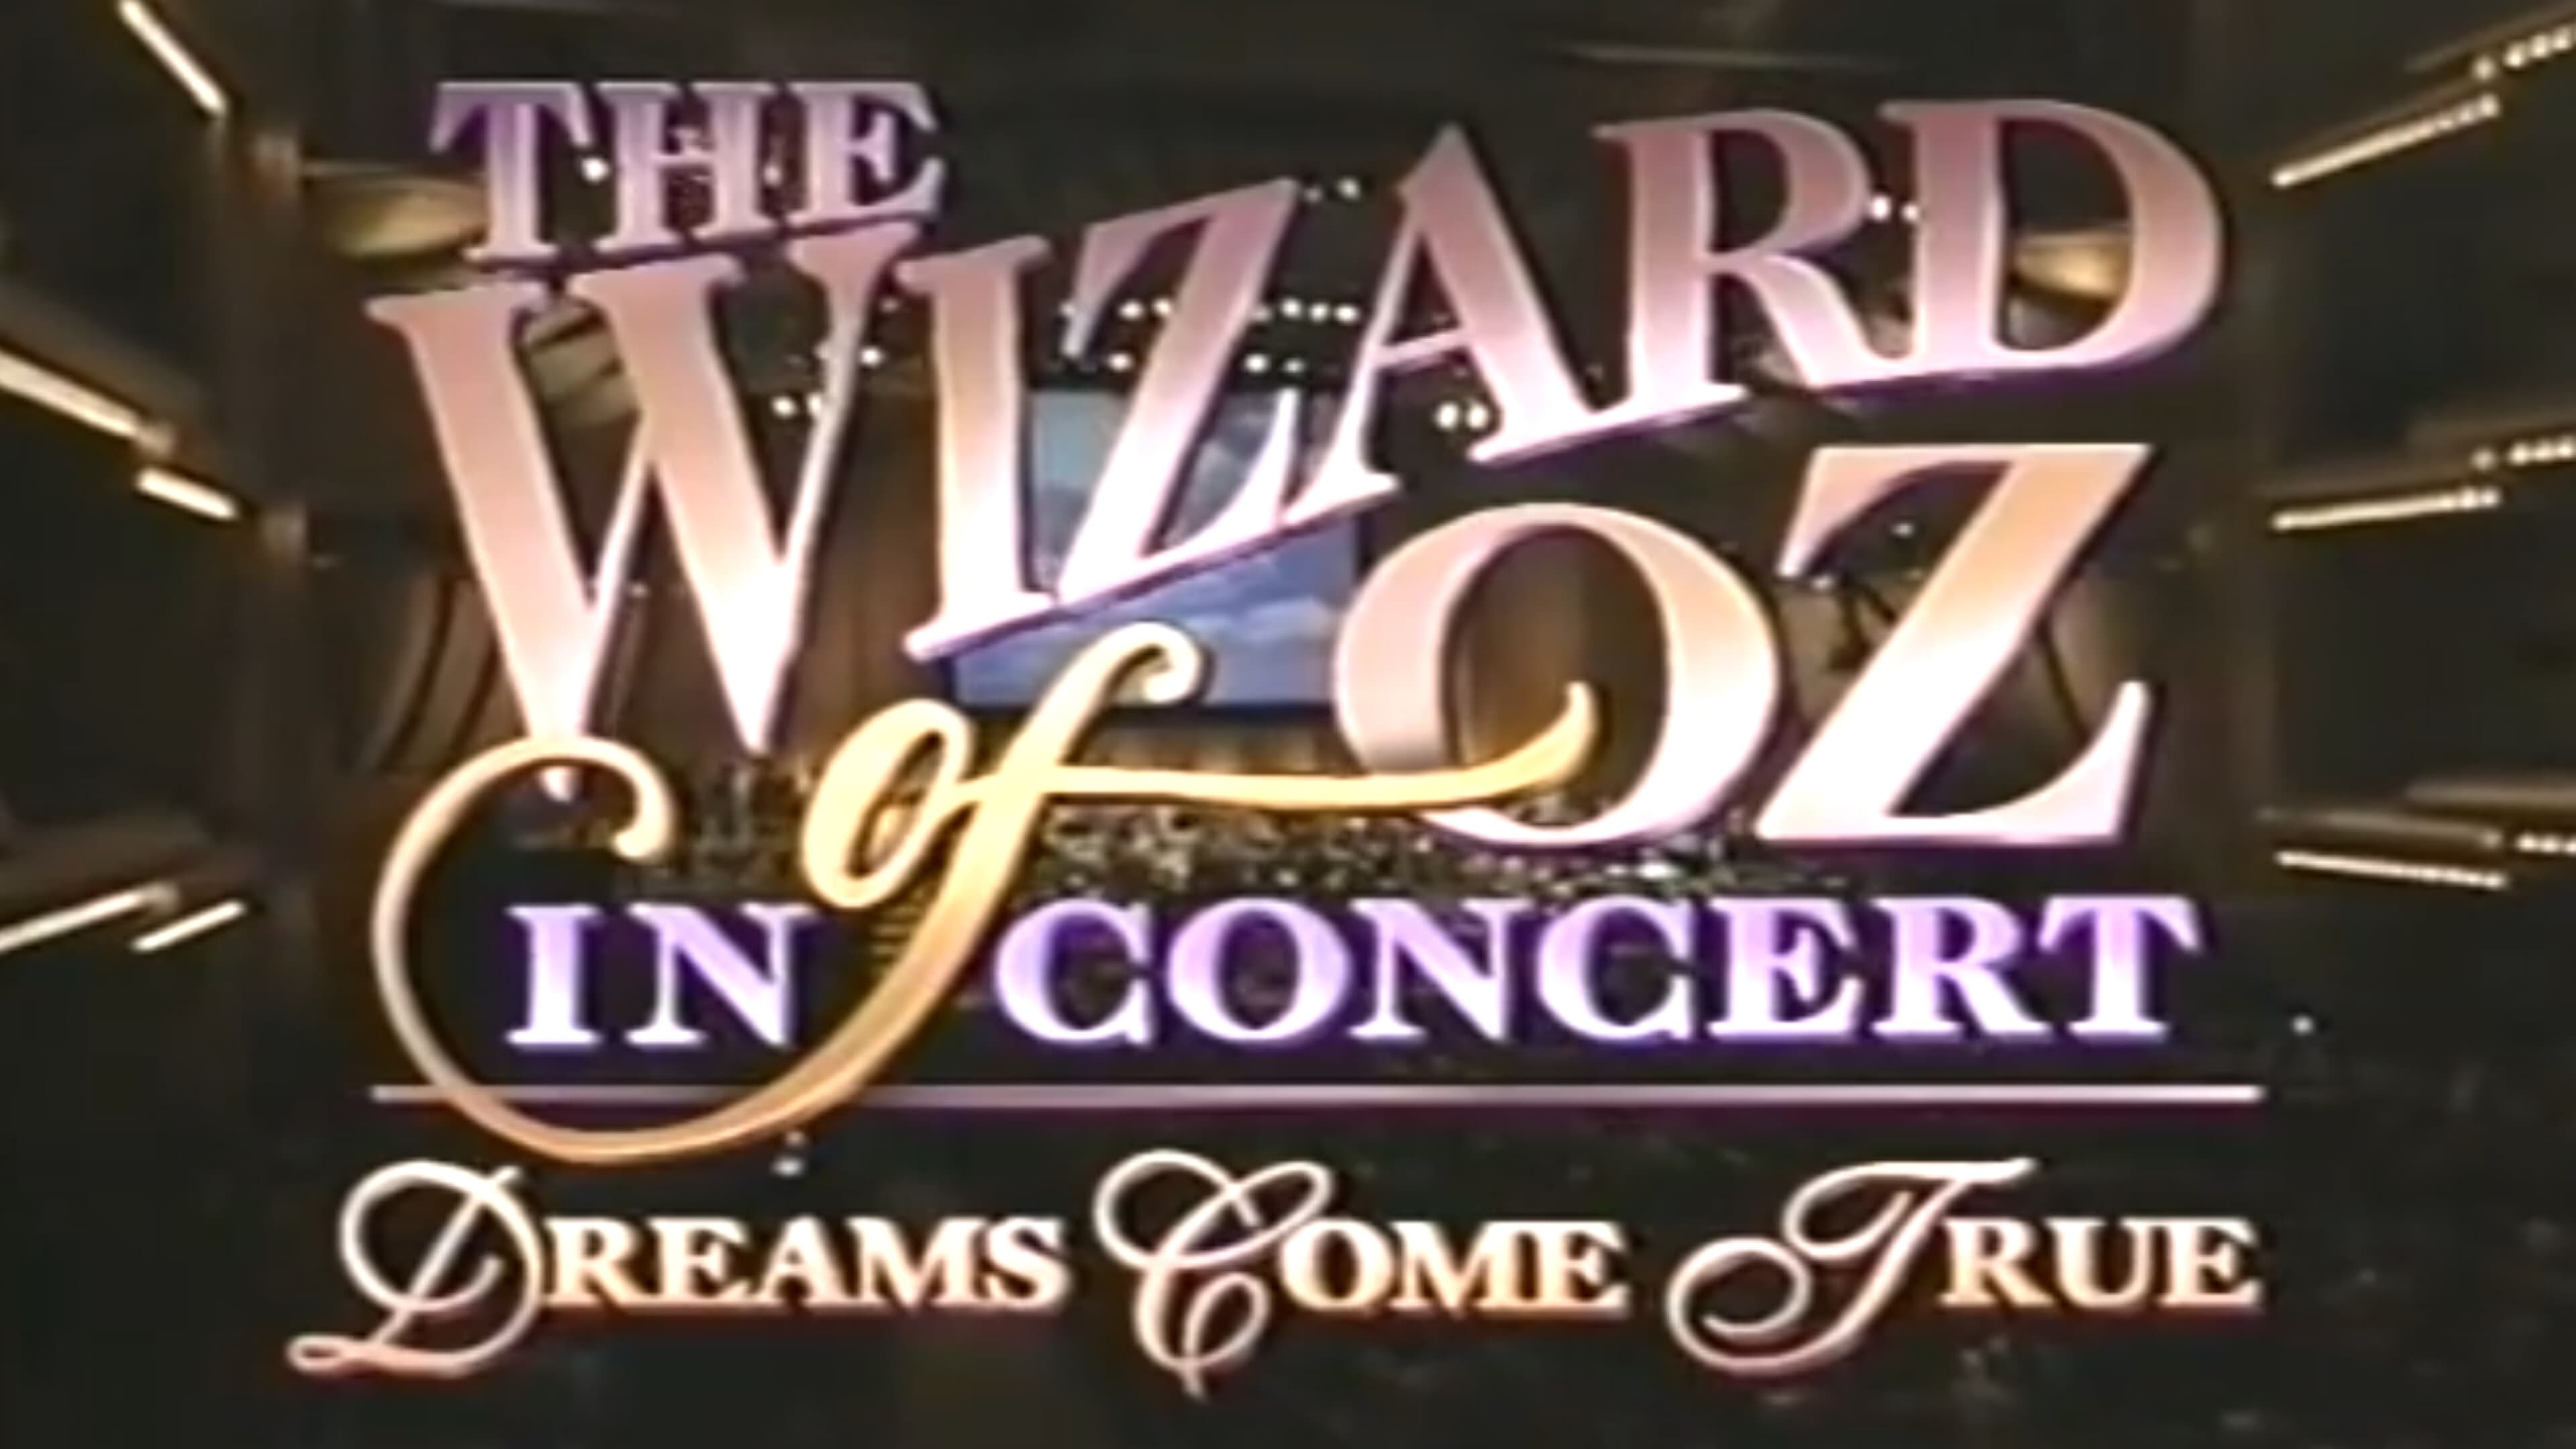 The Wizard of Oz in Concert: Dreams Come True (1995)